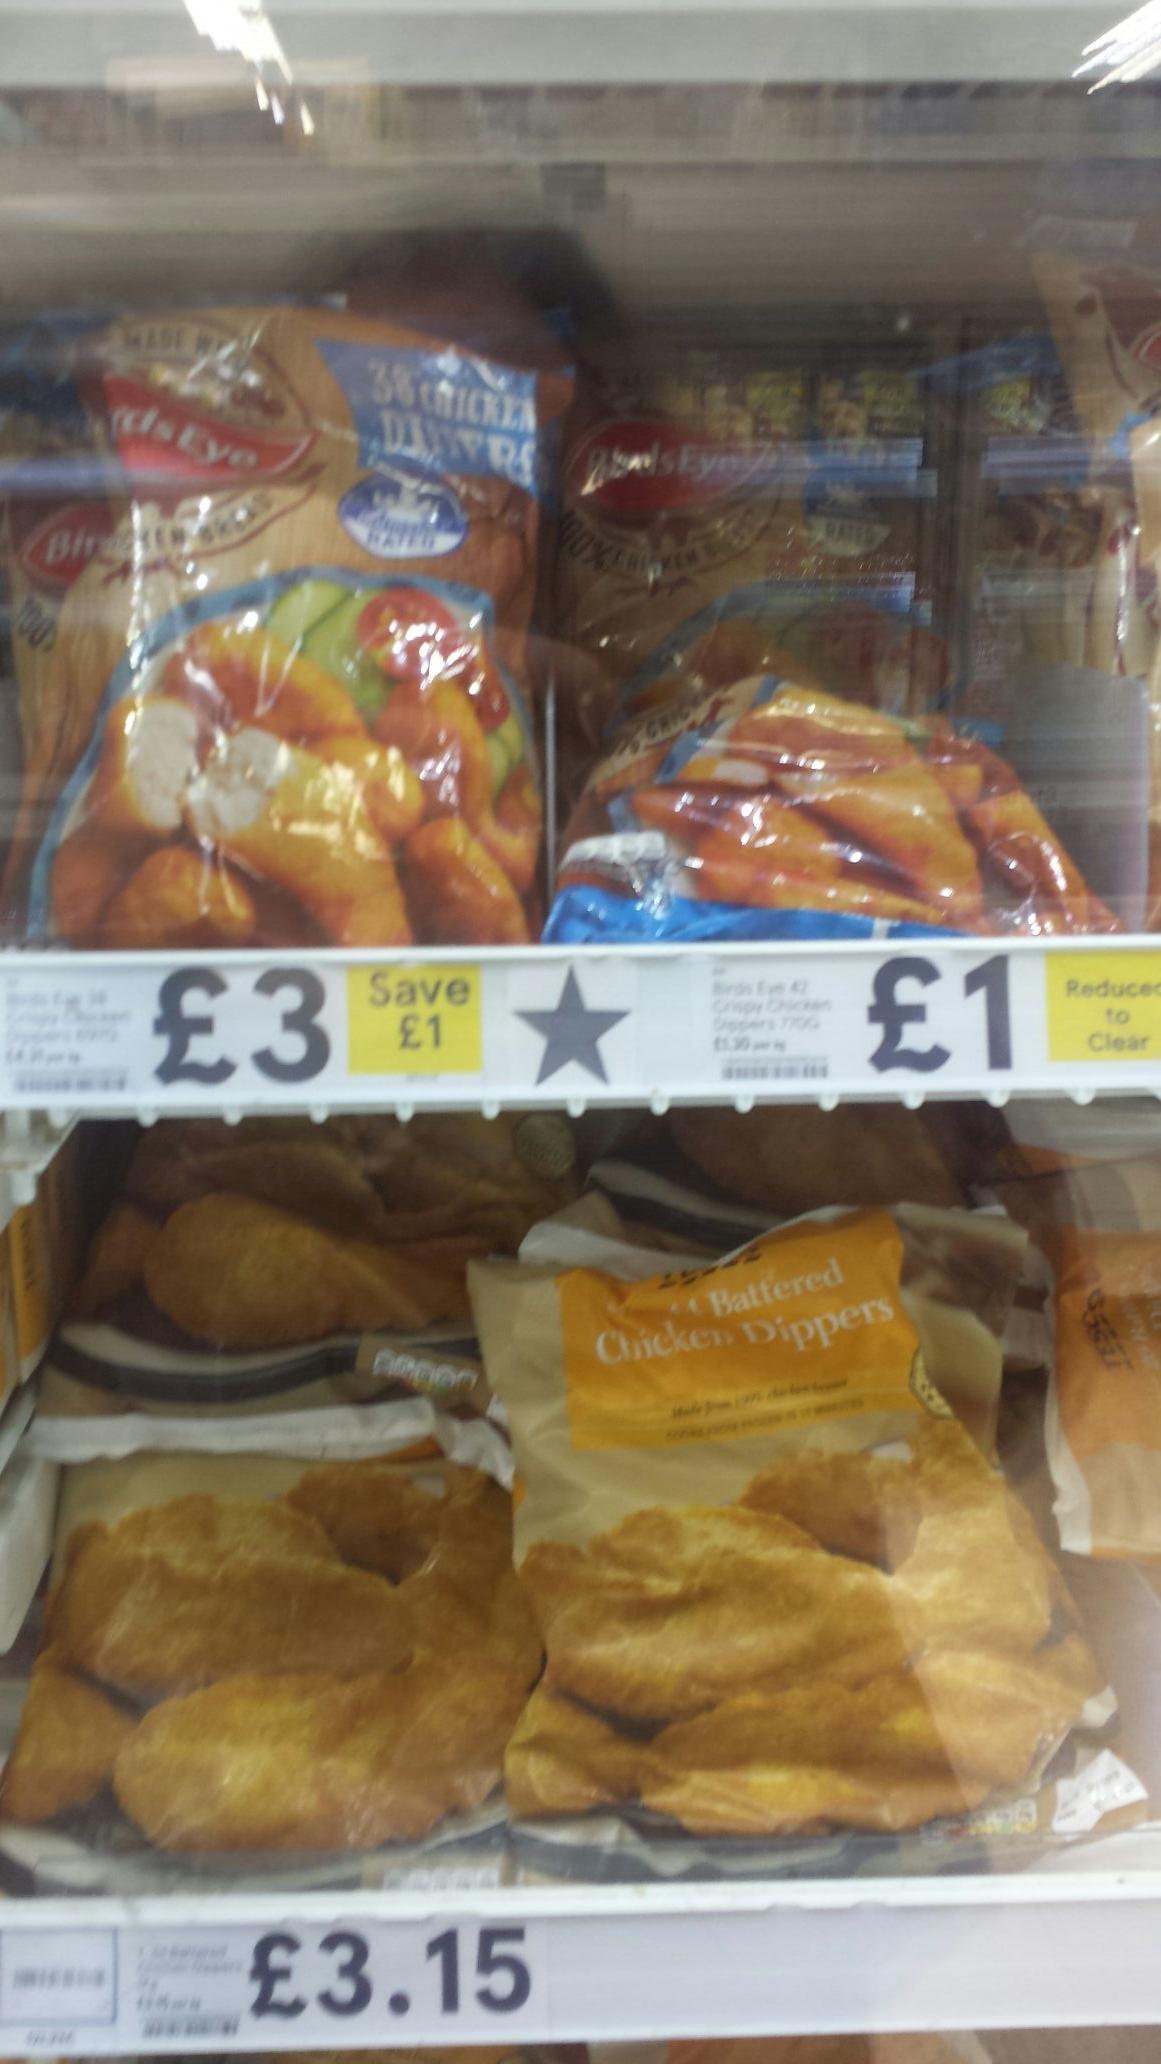 Birds Eye 100% Chicken Breast - 42 Chicken Dippers £1 instore @ Tesco